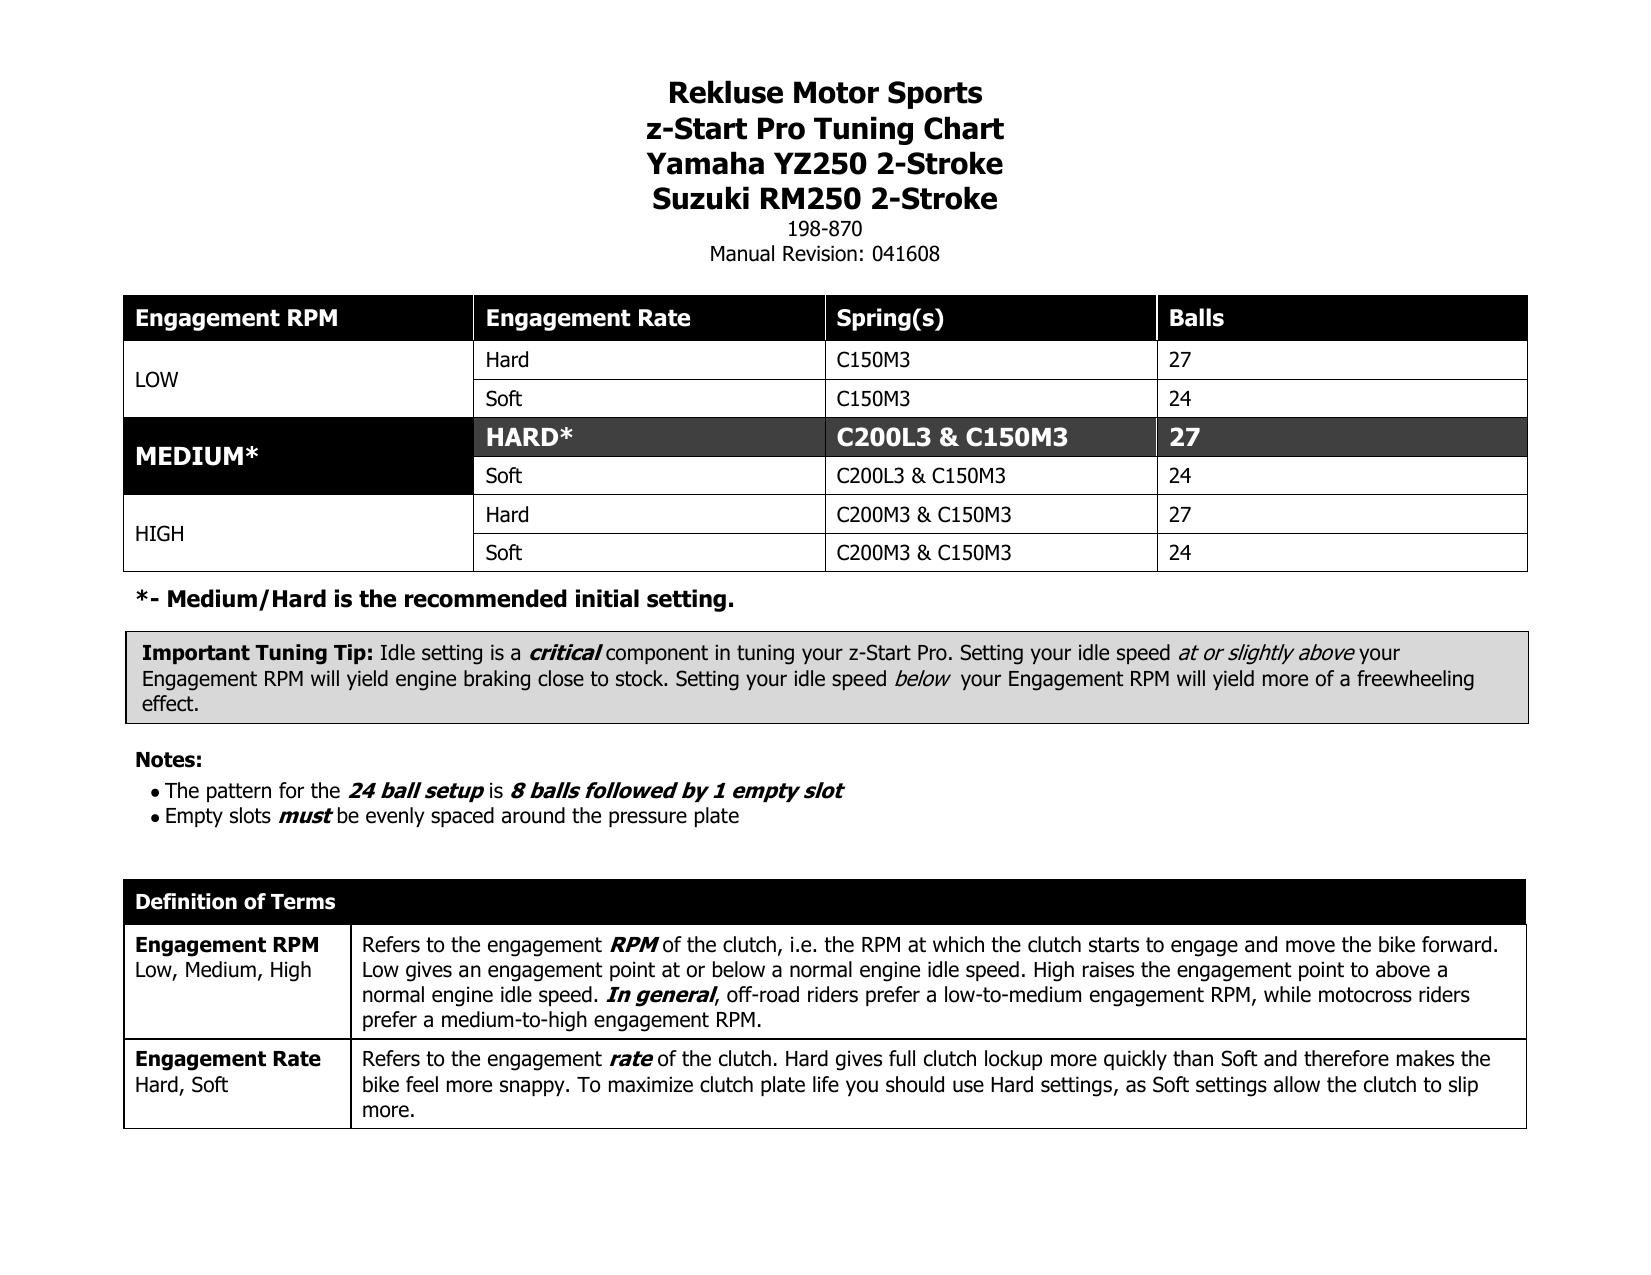 Rekluse Motor Sports z-Start Pro Tuning Chart Yamaha YZ250 2